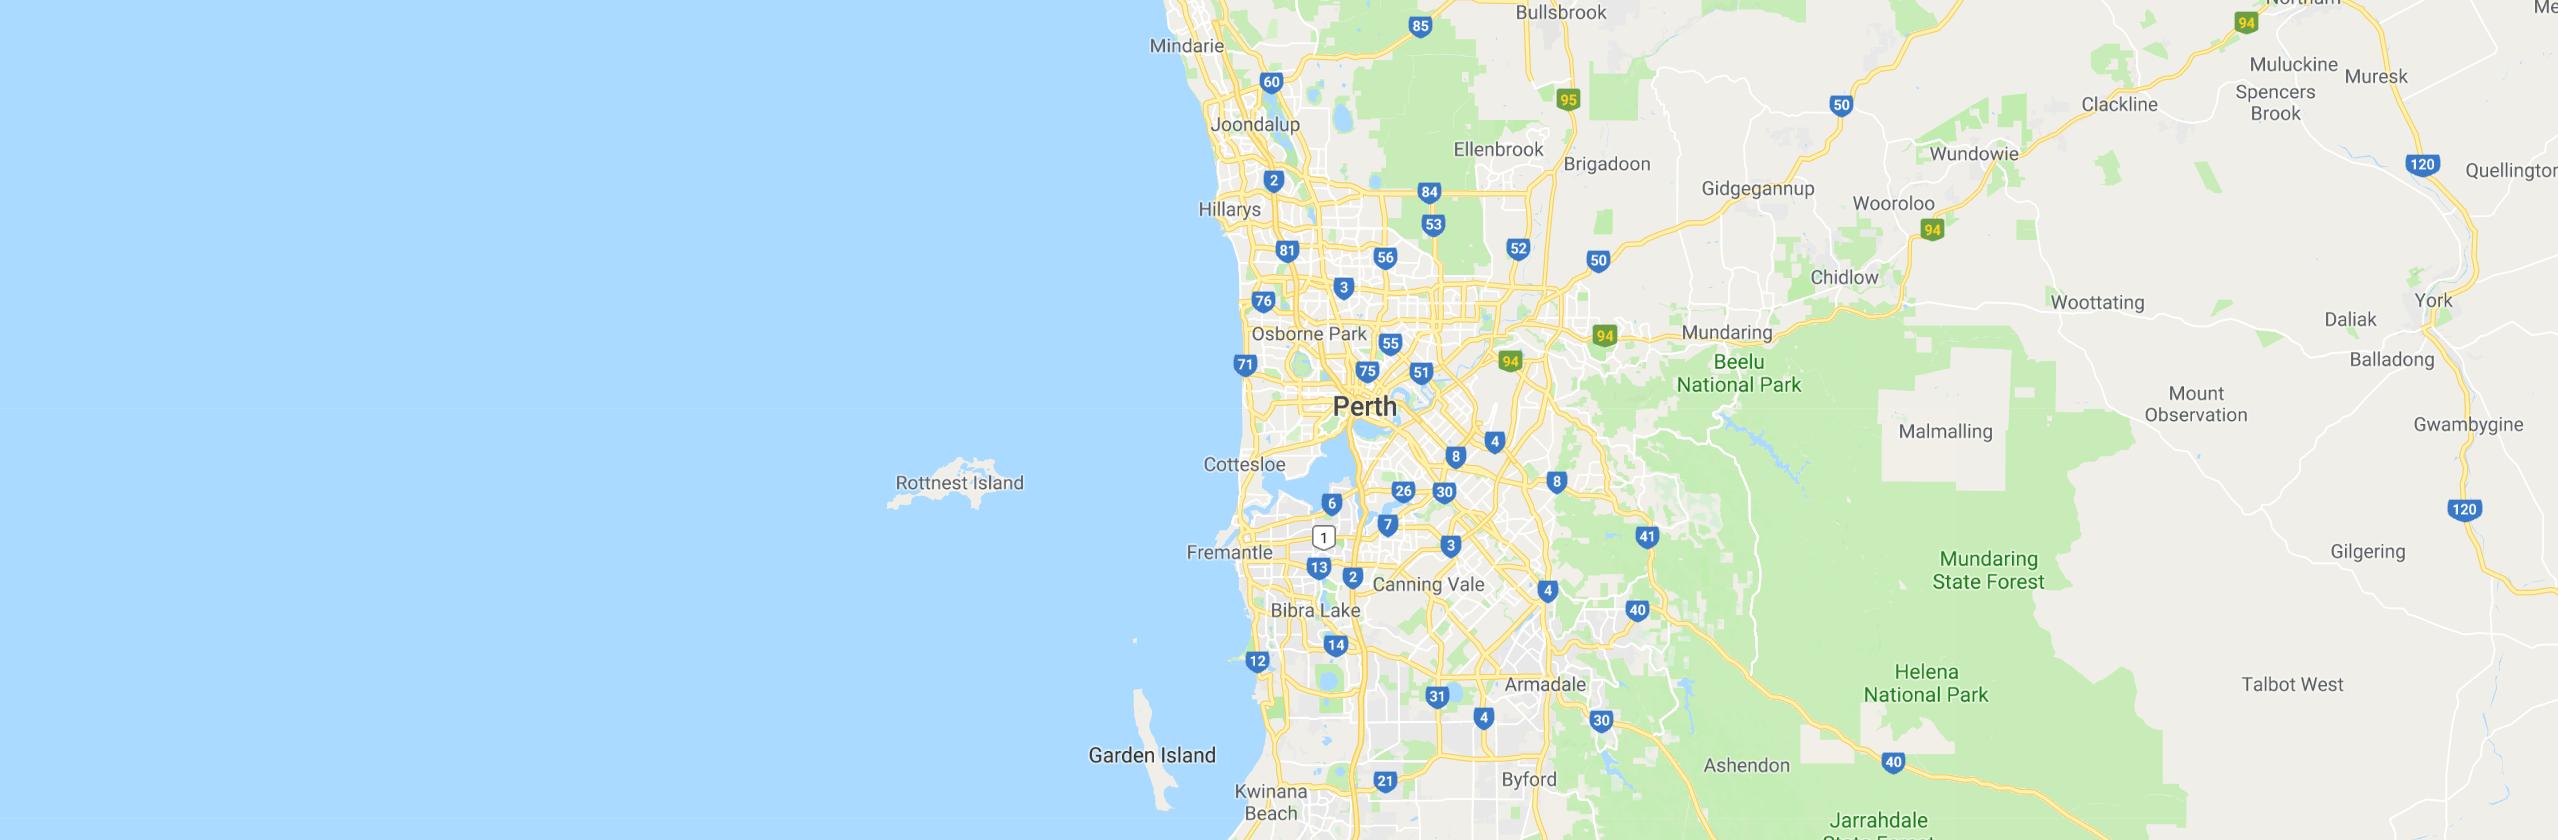 Google Map of Northern Suburbs,Western Australia, Australia